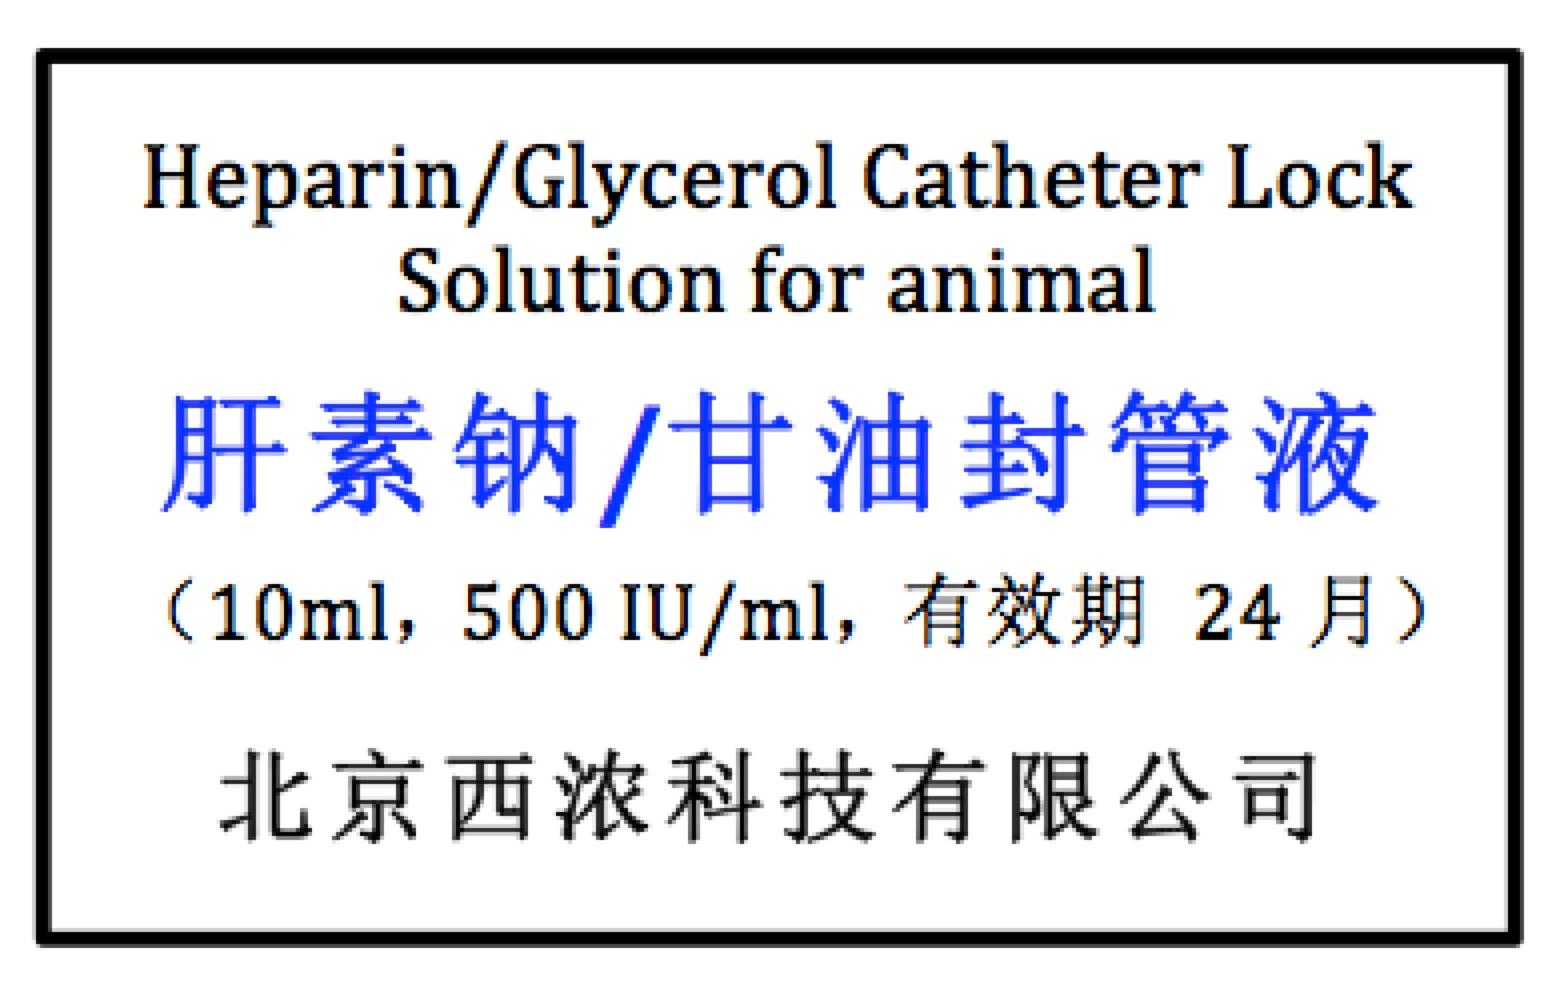 血管插管肝素/甘油封管液(Heparin/Glycerol Catheter Loc Solution)